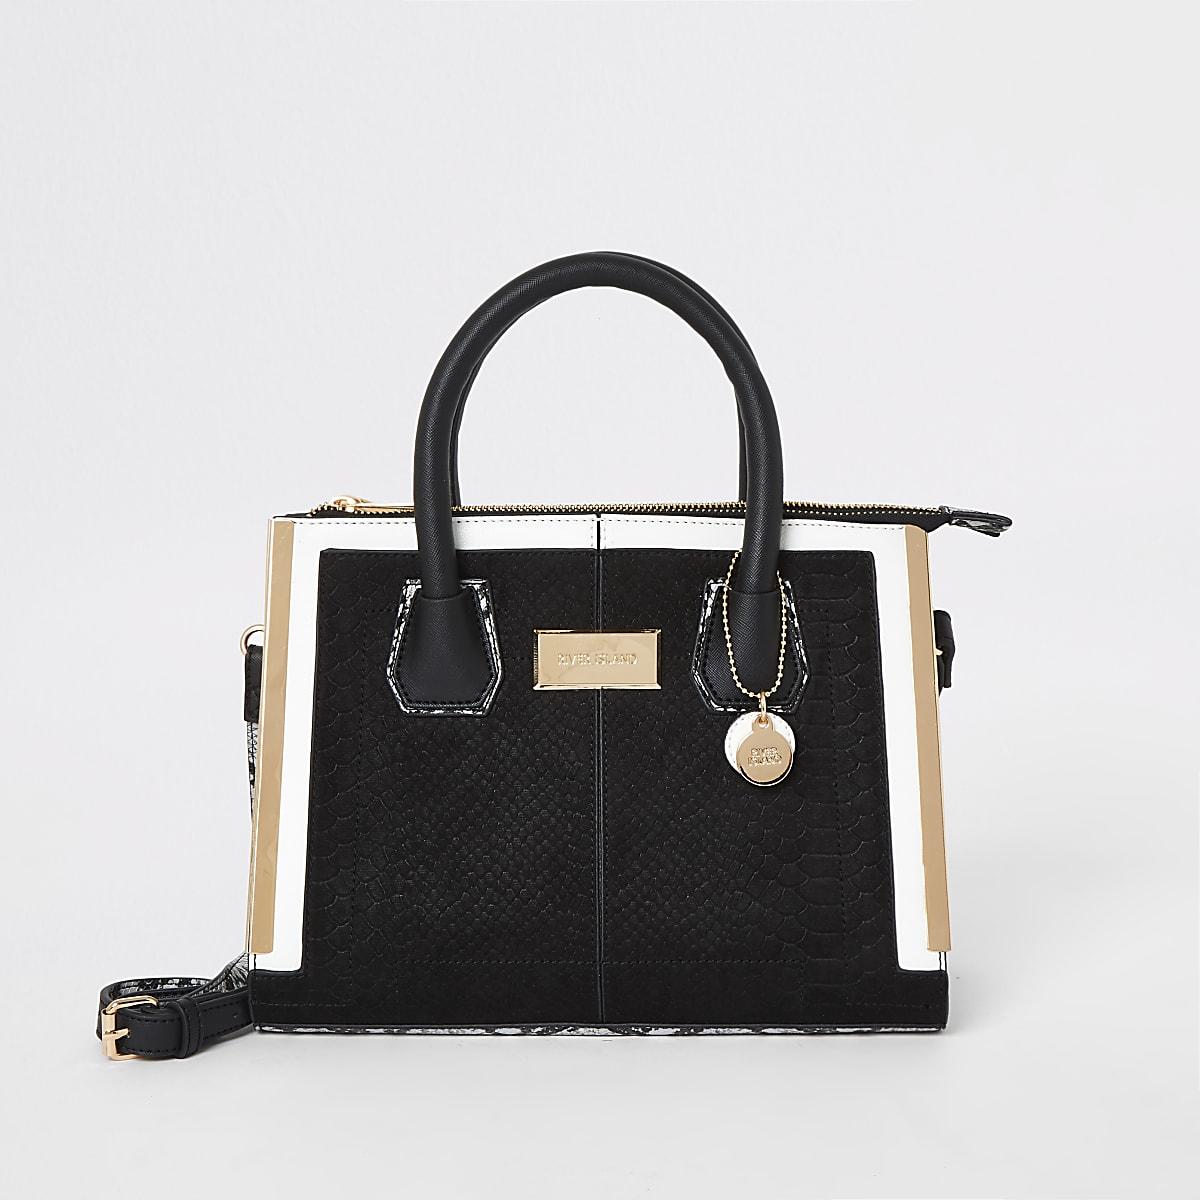 Black gold tone edge tote bag